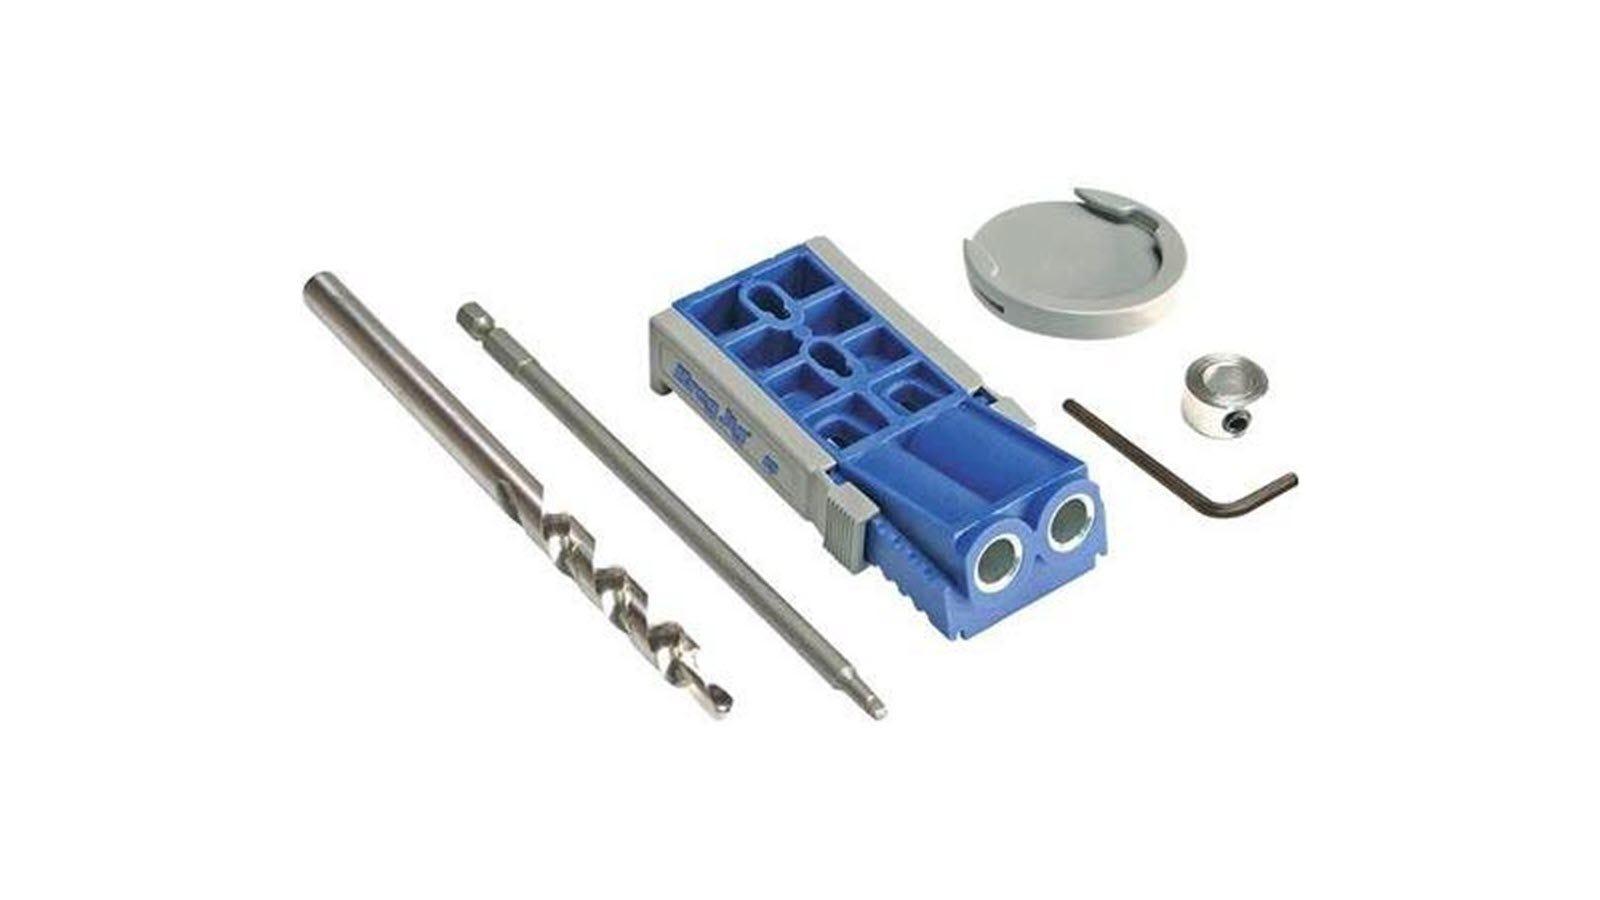 A Kreg R3 Pocket jig with drill bit, drive bit, and depth collar.